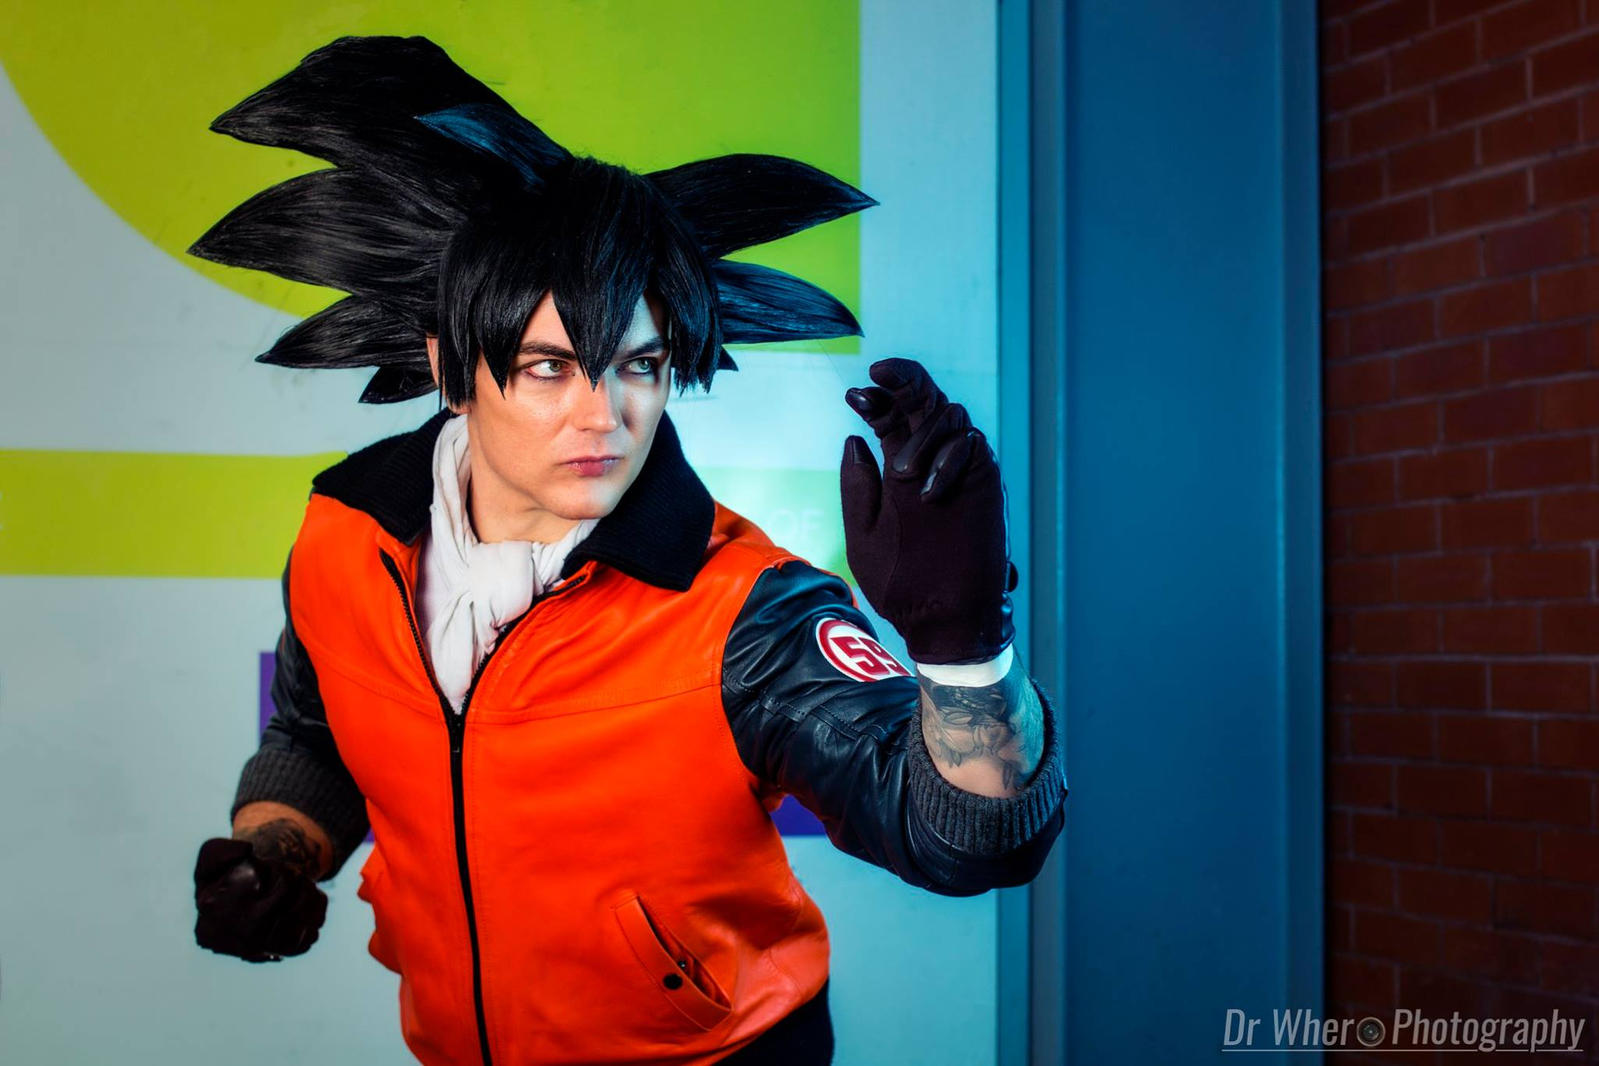 Son Goku Dragon Ball Z Cosplay 59 Jacket Cell Saga By